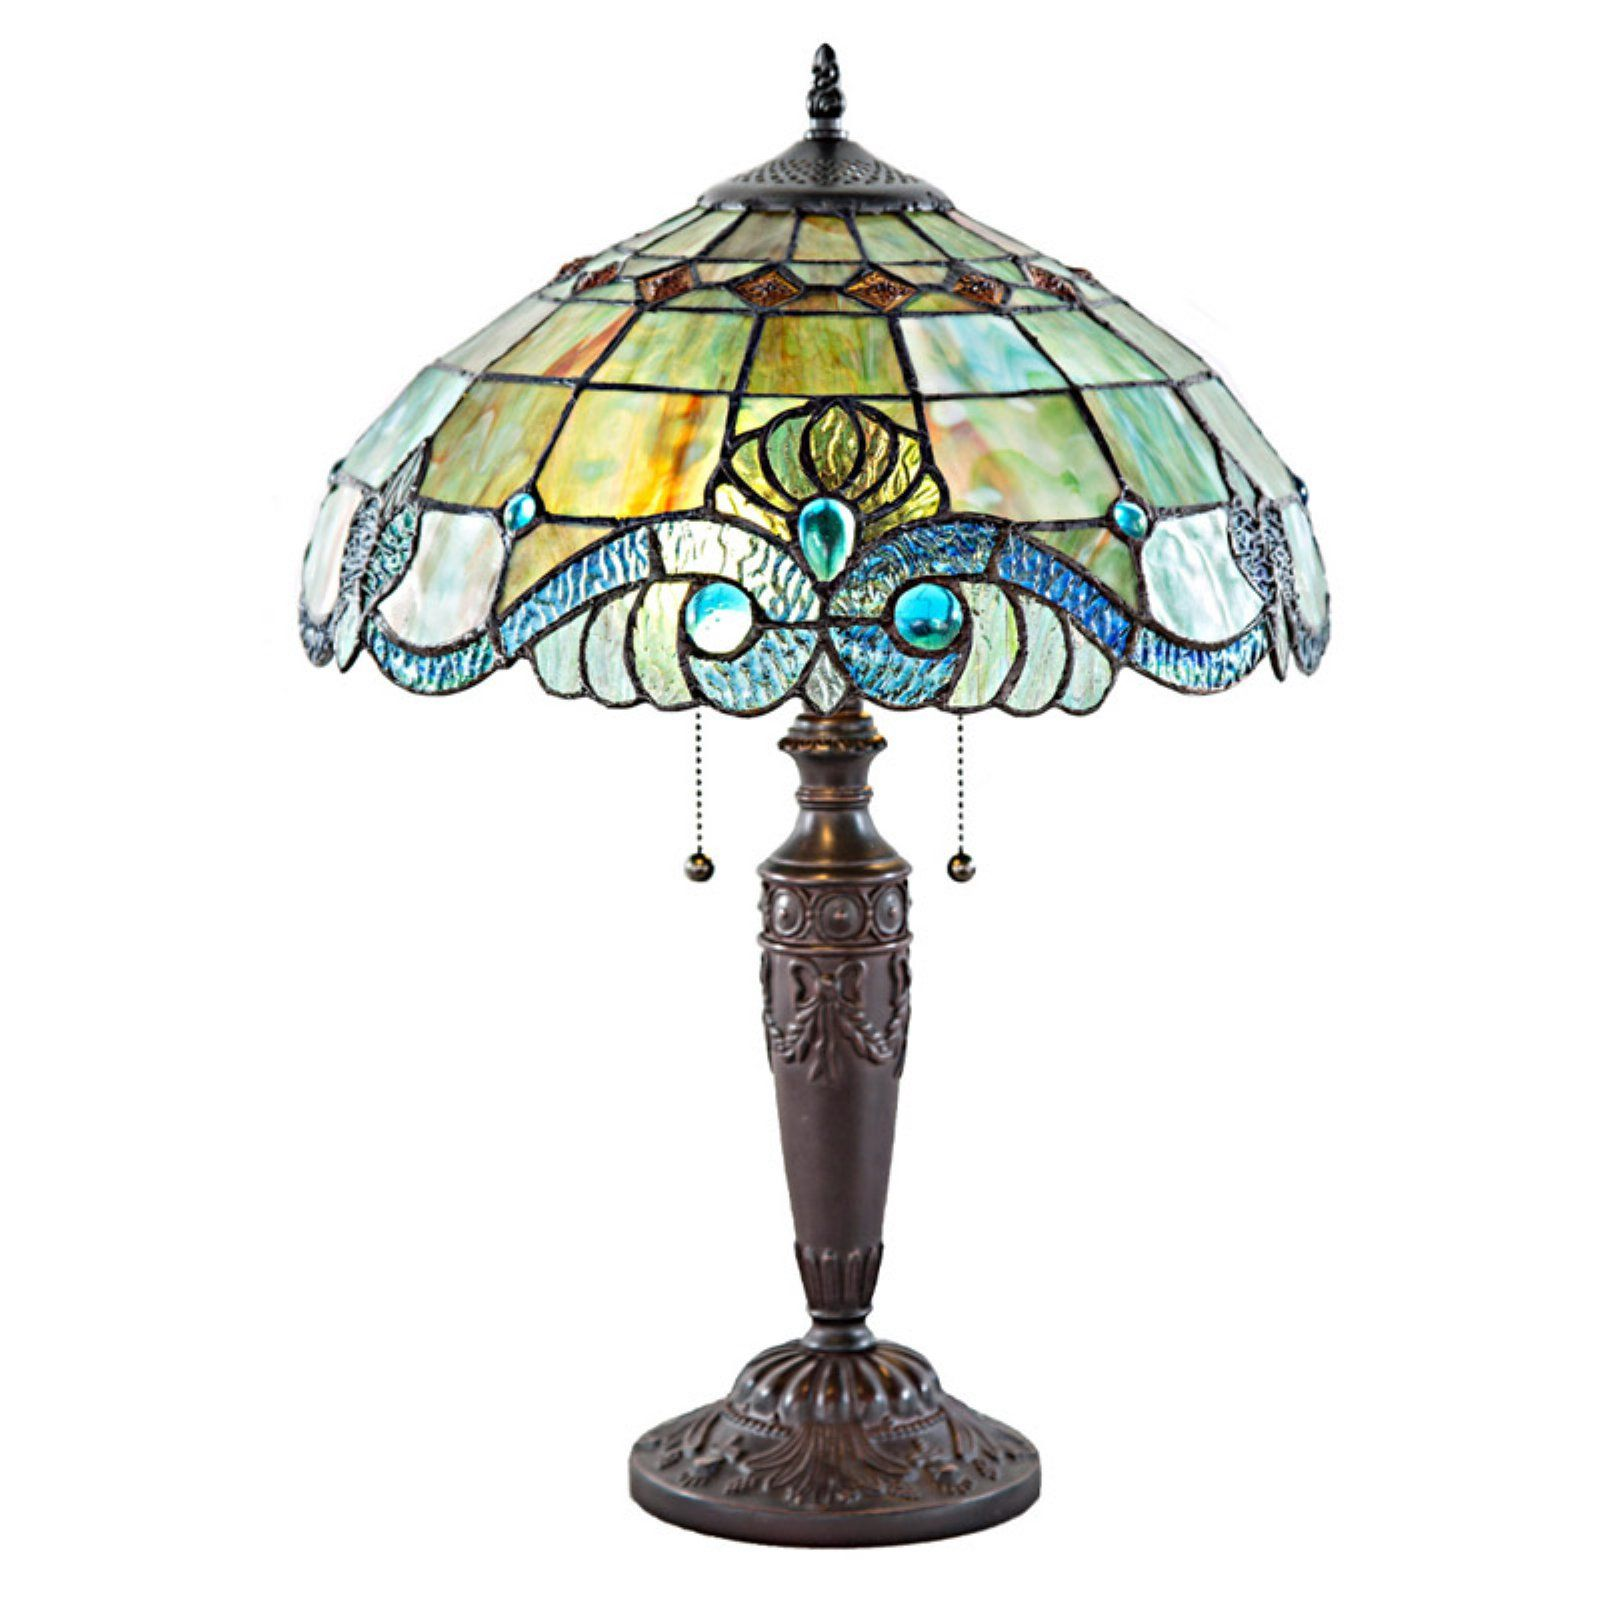 River Of Goods Tiffany Vivaldi Table Lamp Green Blue Amber Lamp